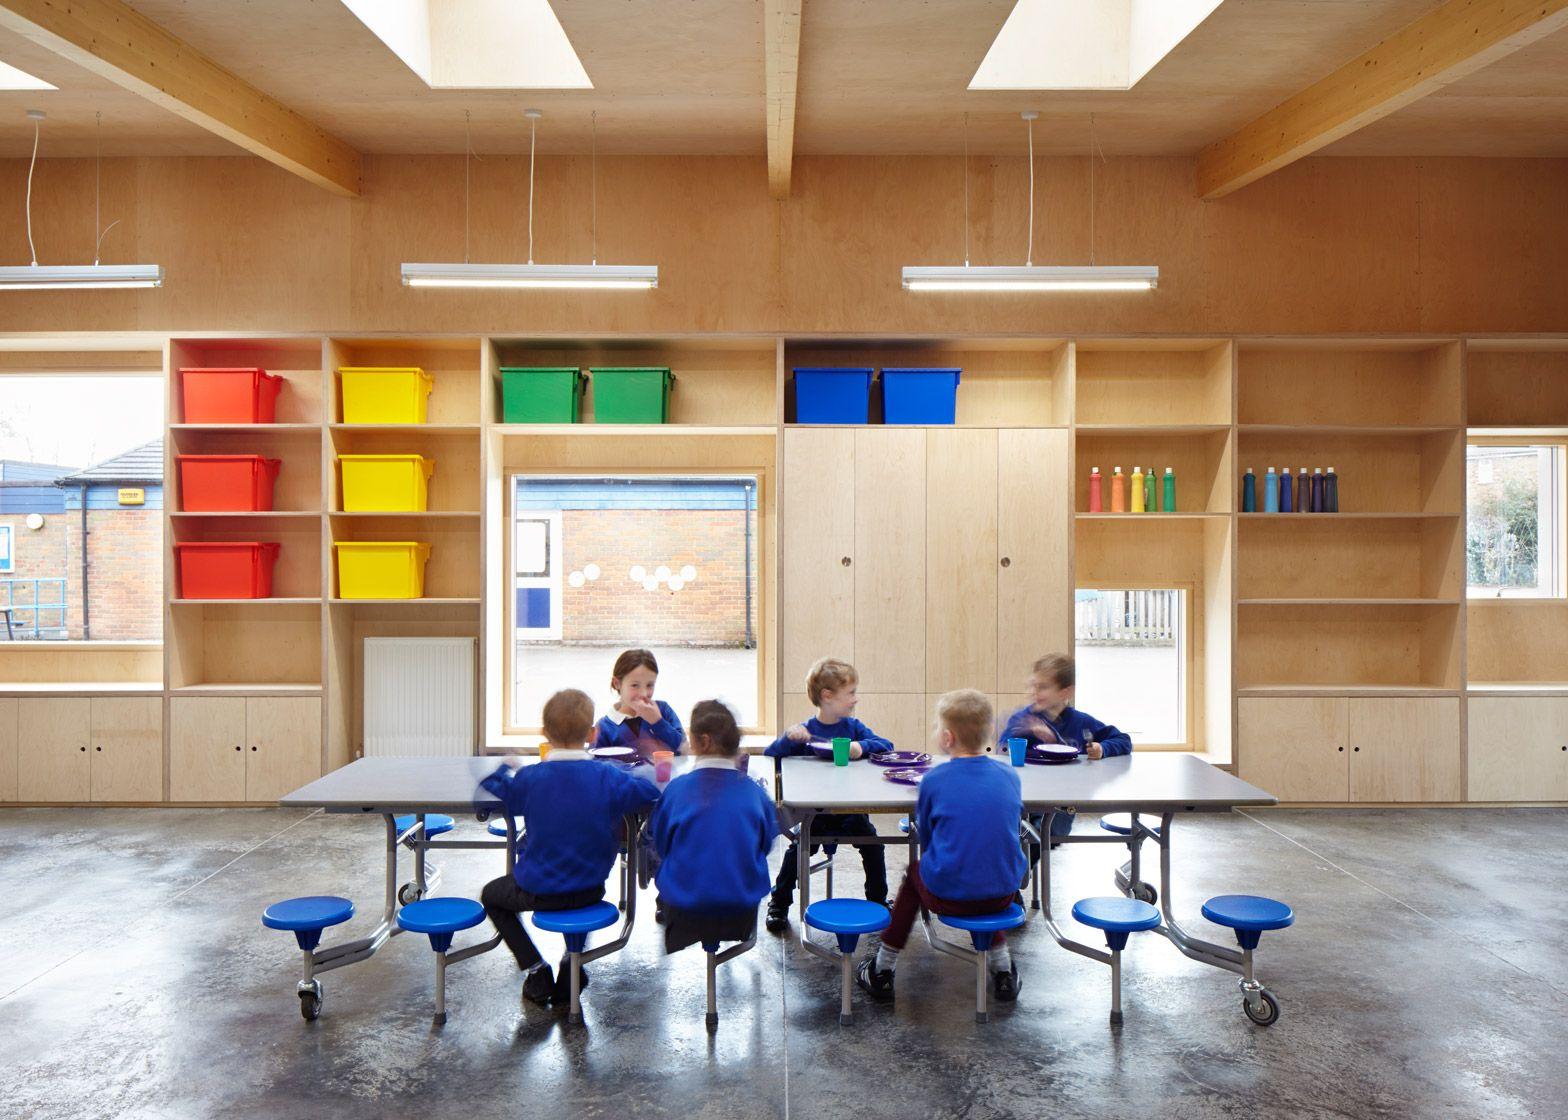 School Dining Hall Recreates Fantastic Mr Fox's Underground Endearing School Dining Room Design Inspiration